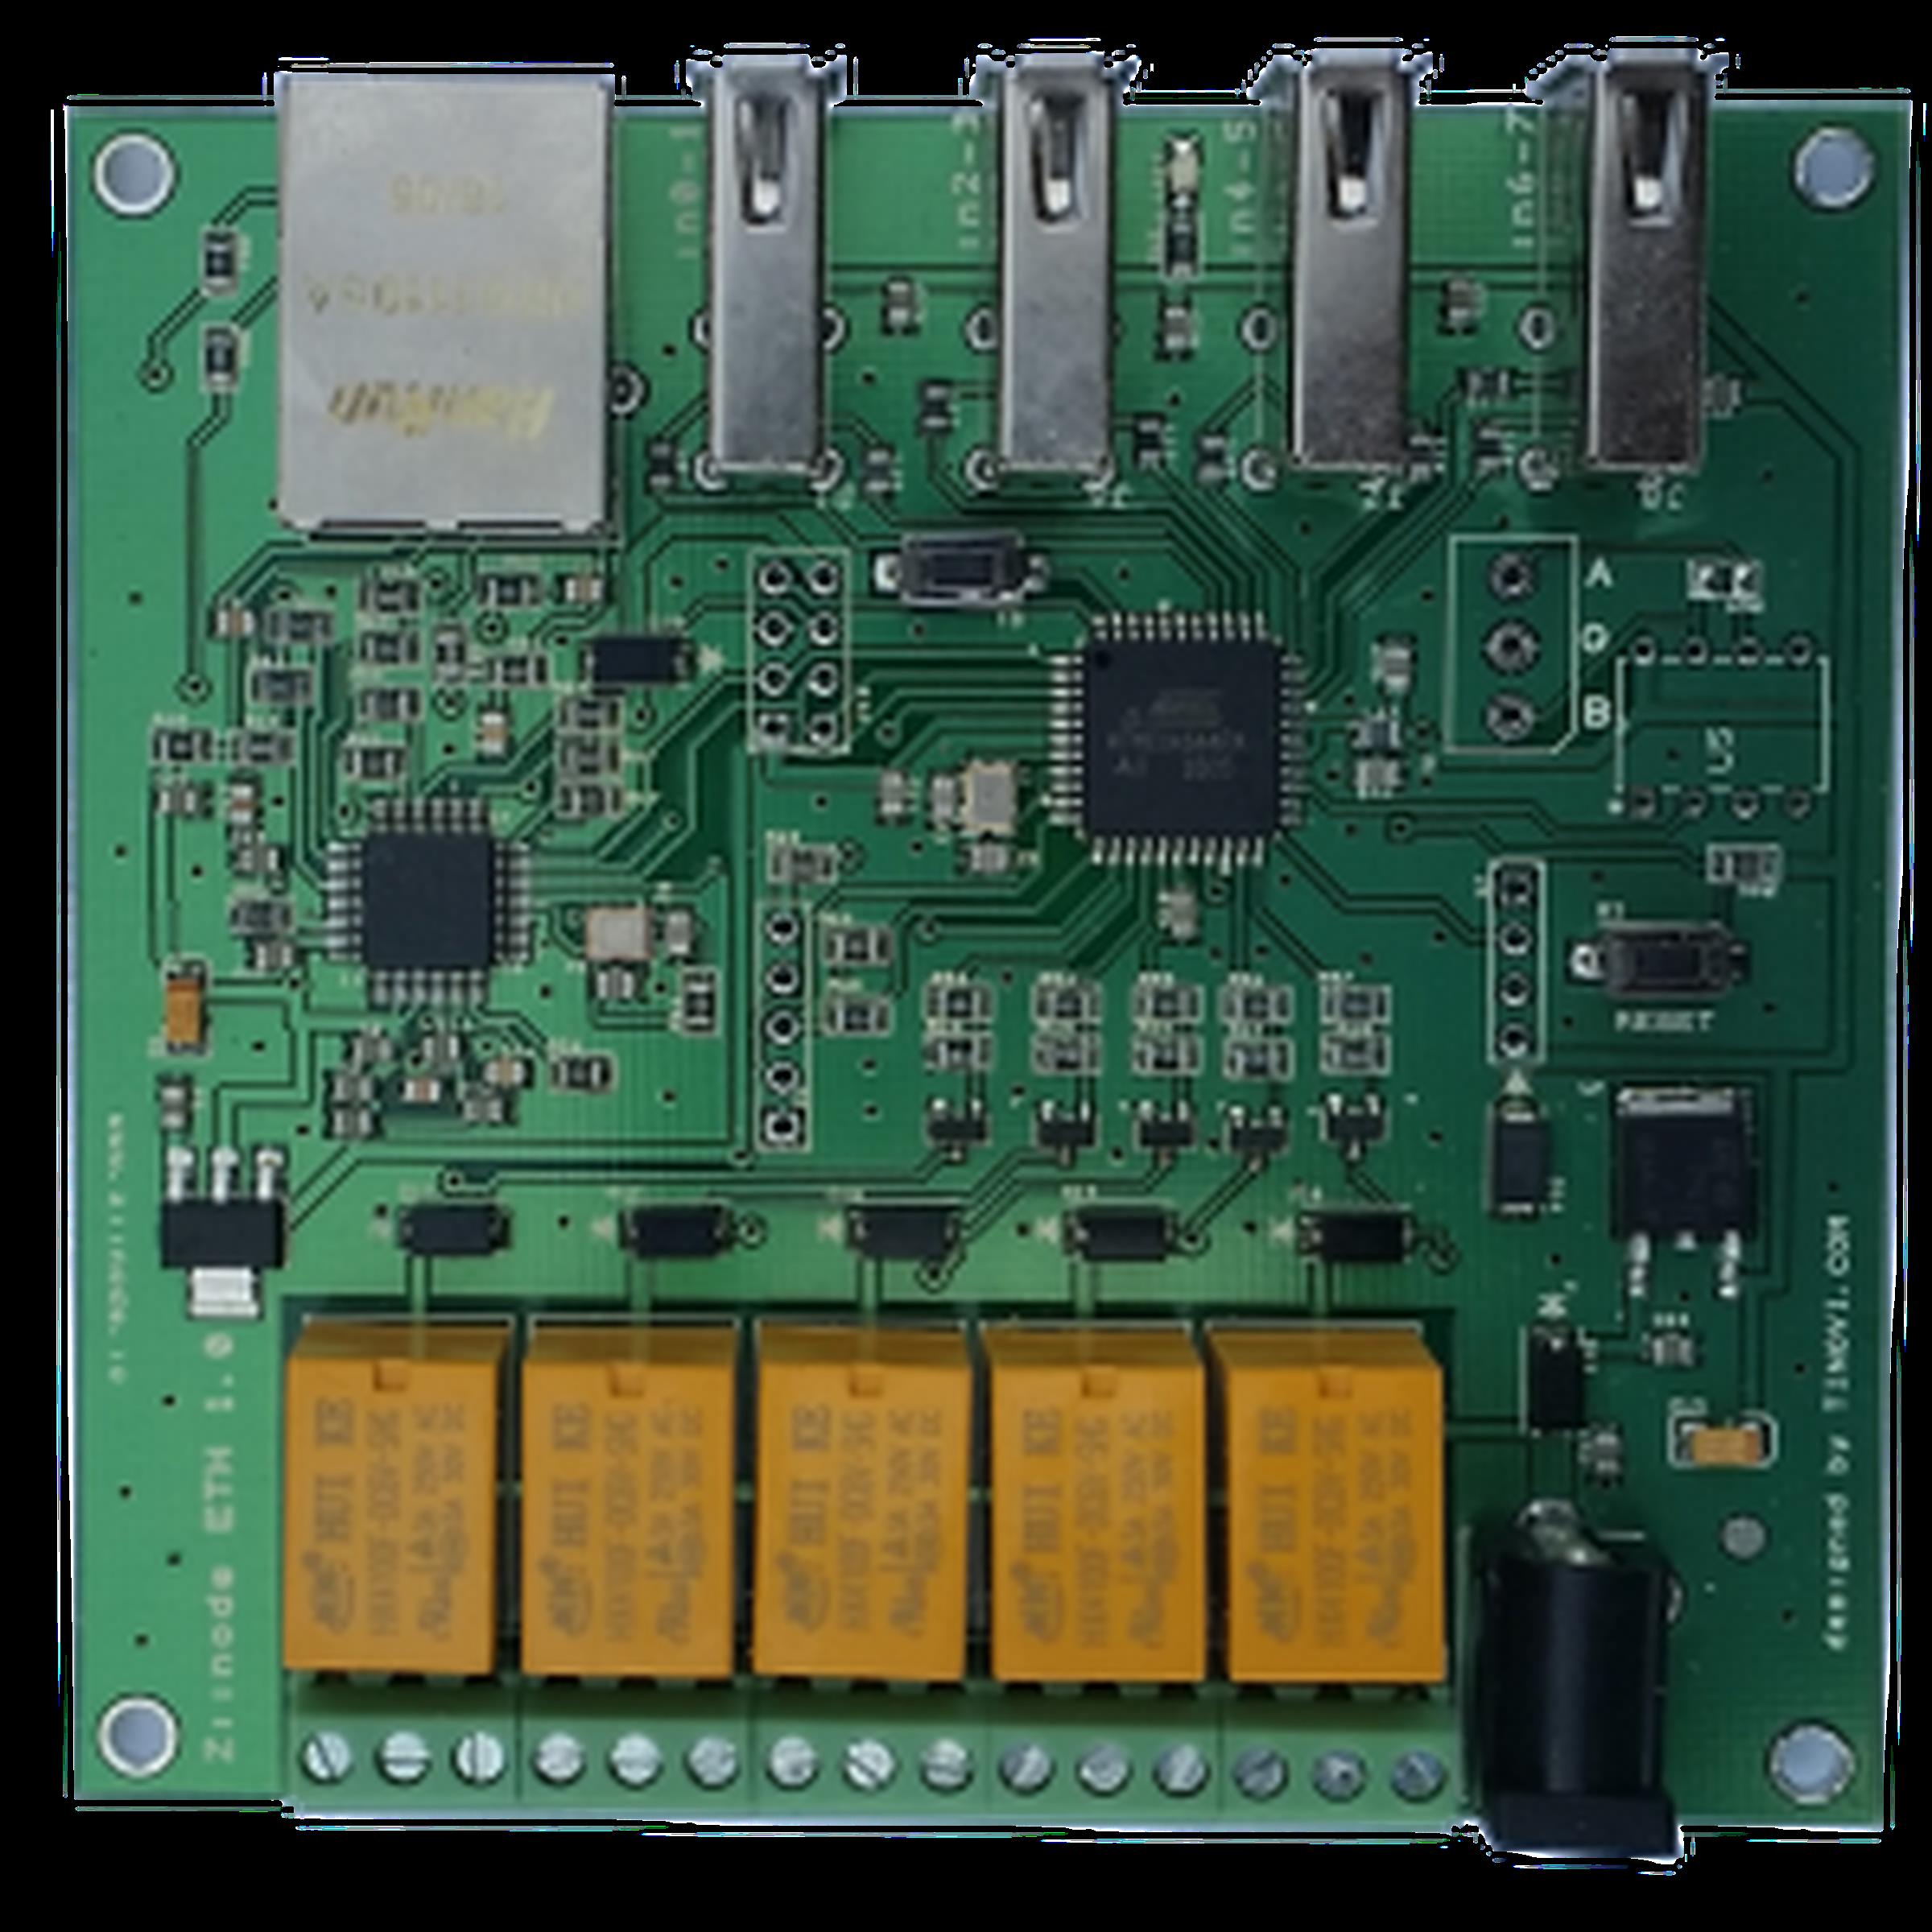 Iot arduino avr ethernet development board from tinovi on